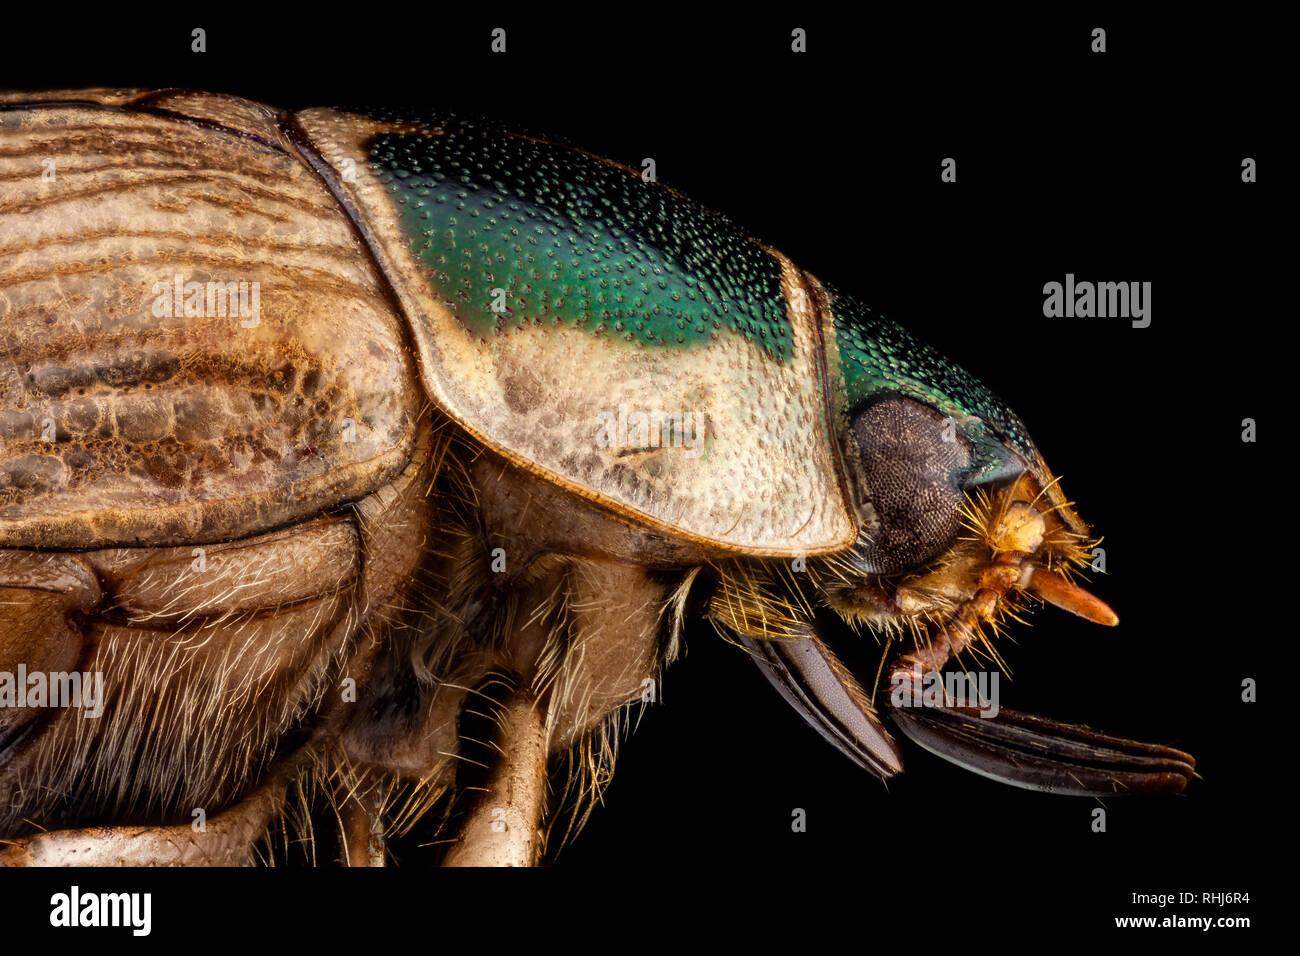 Profile portrait of a Japanese beetle - Stock Image